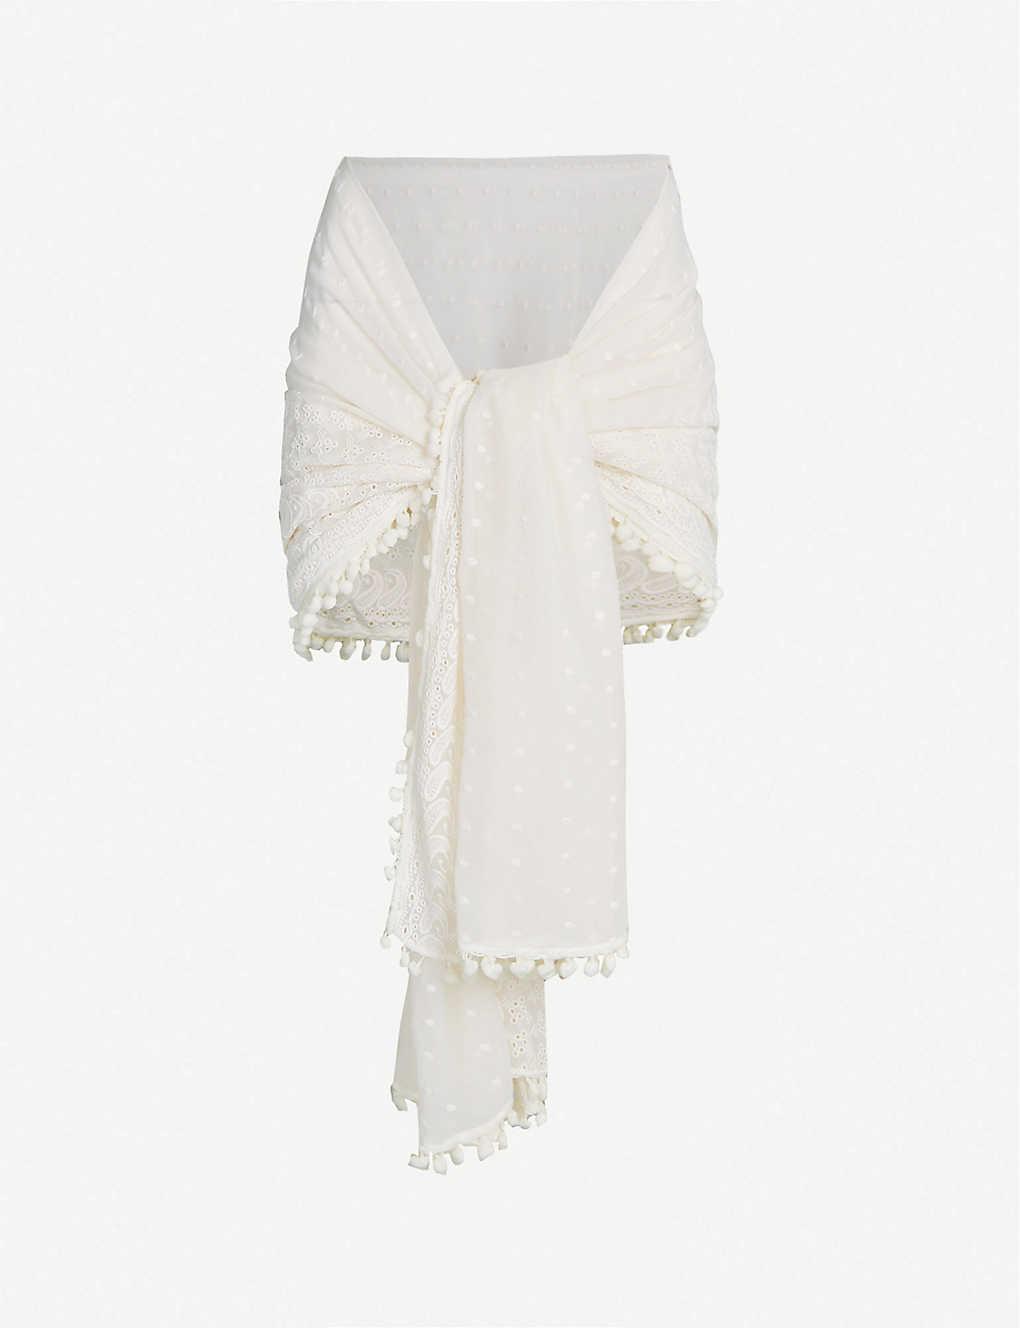 7143f2da58c88d MELISSA ODABASH - Pareo embroidered georgette sarong | Selfridges.com